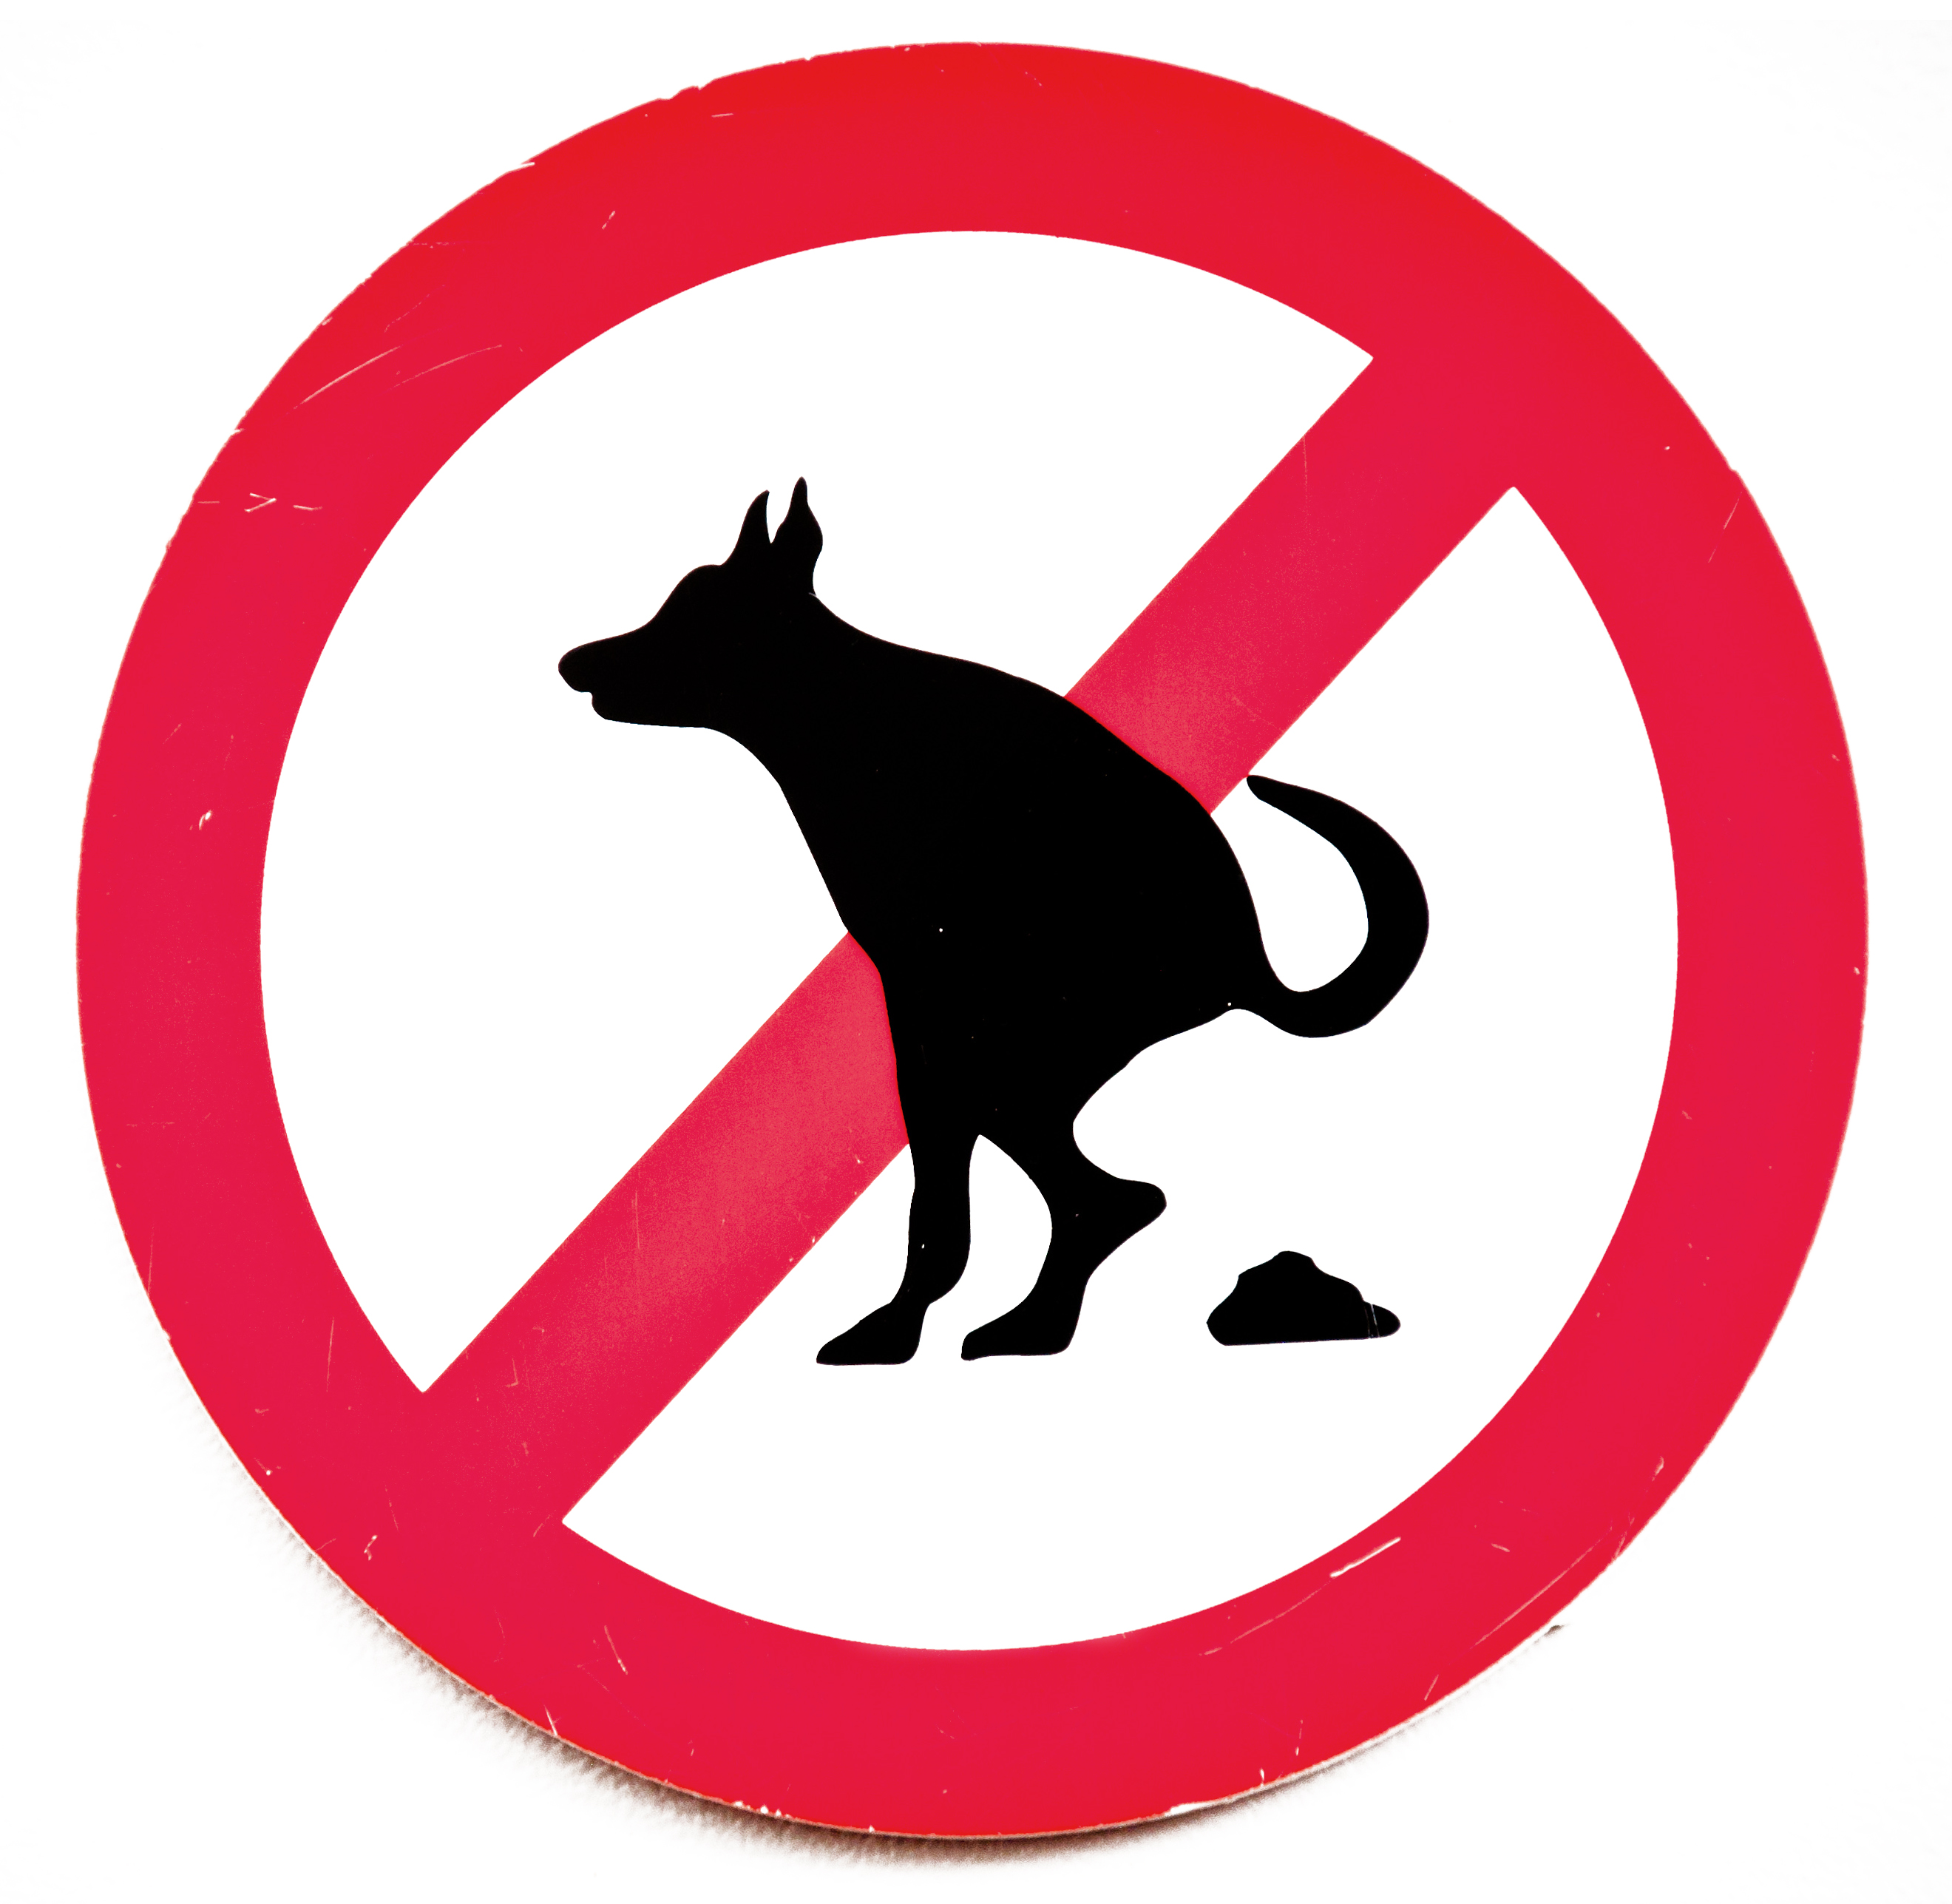 No dog poop sign photo